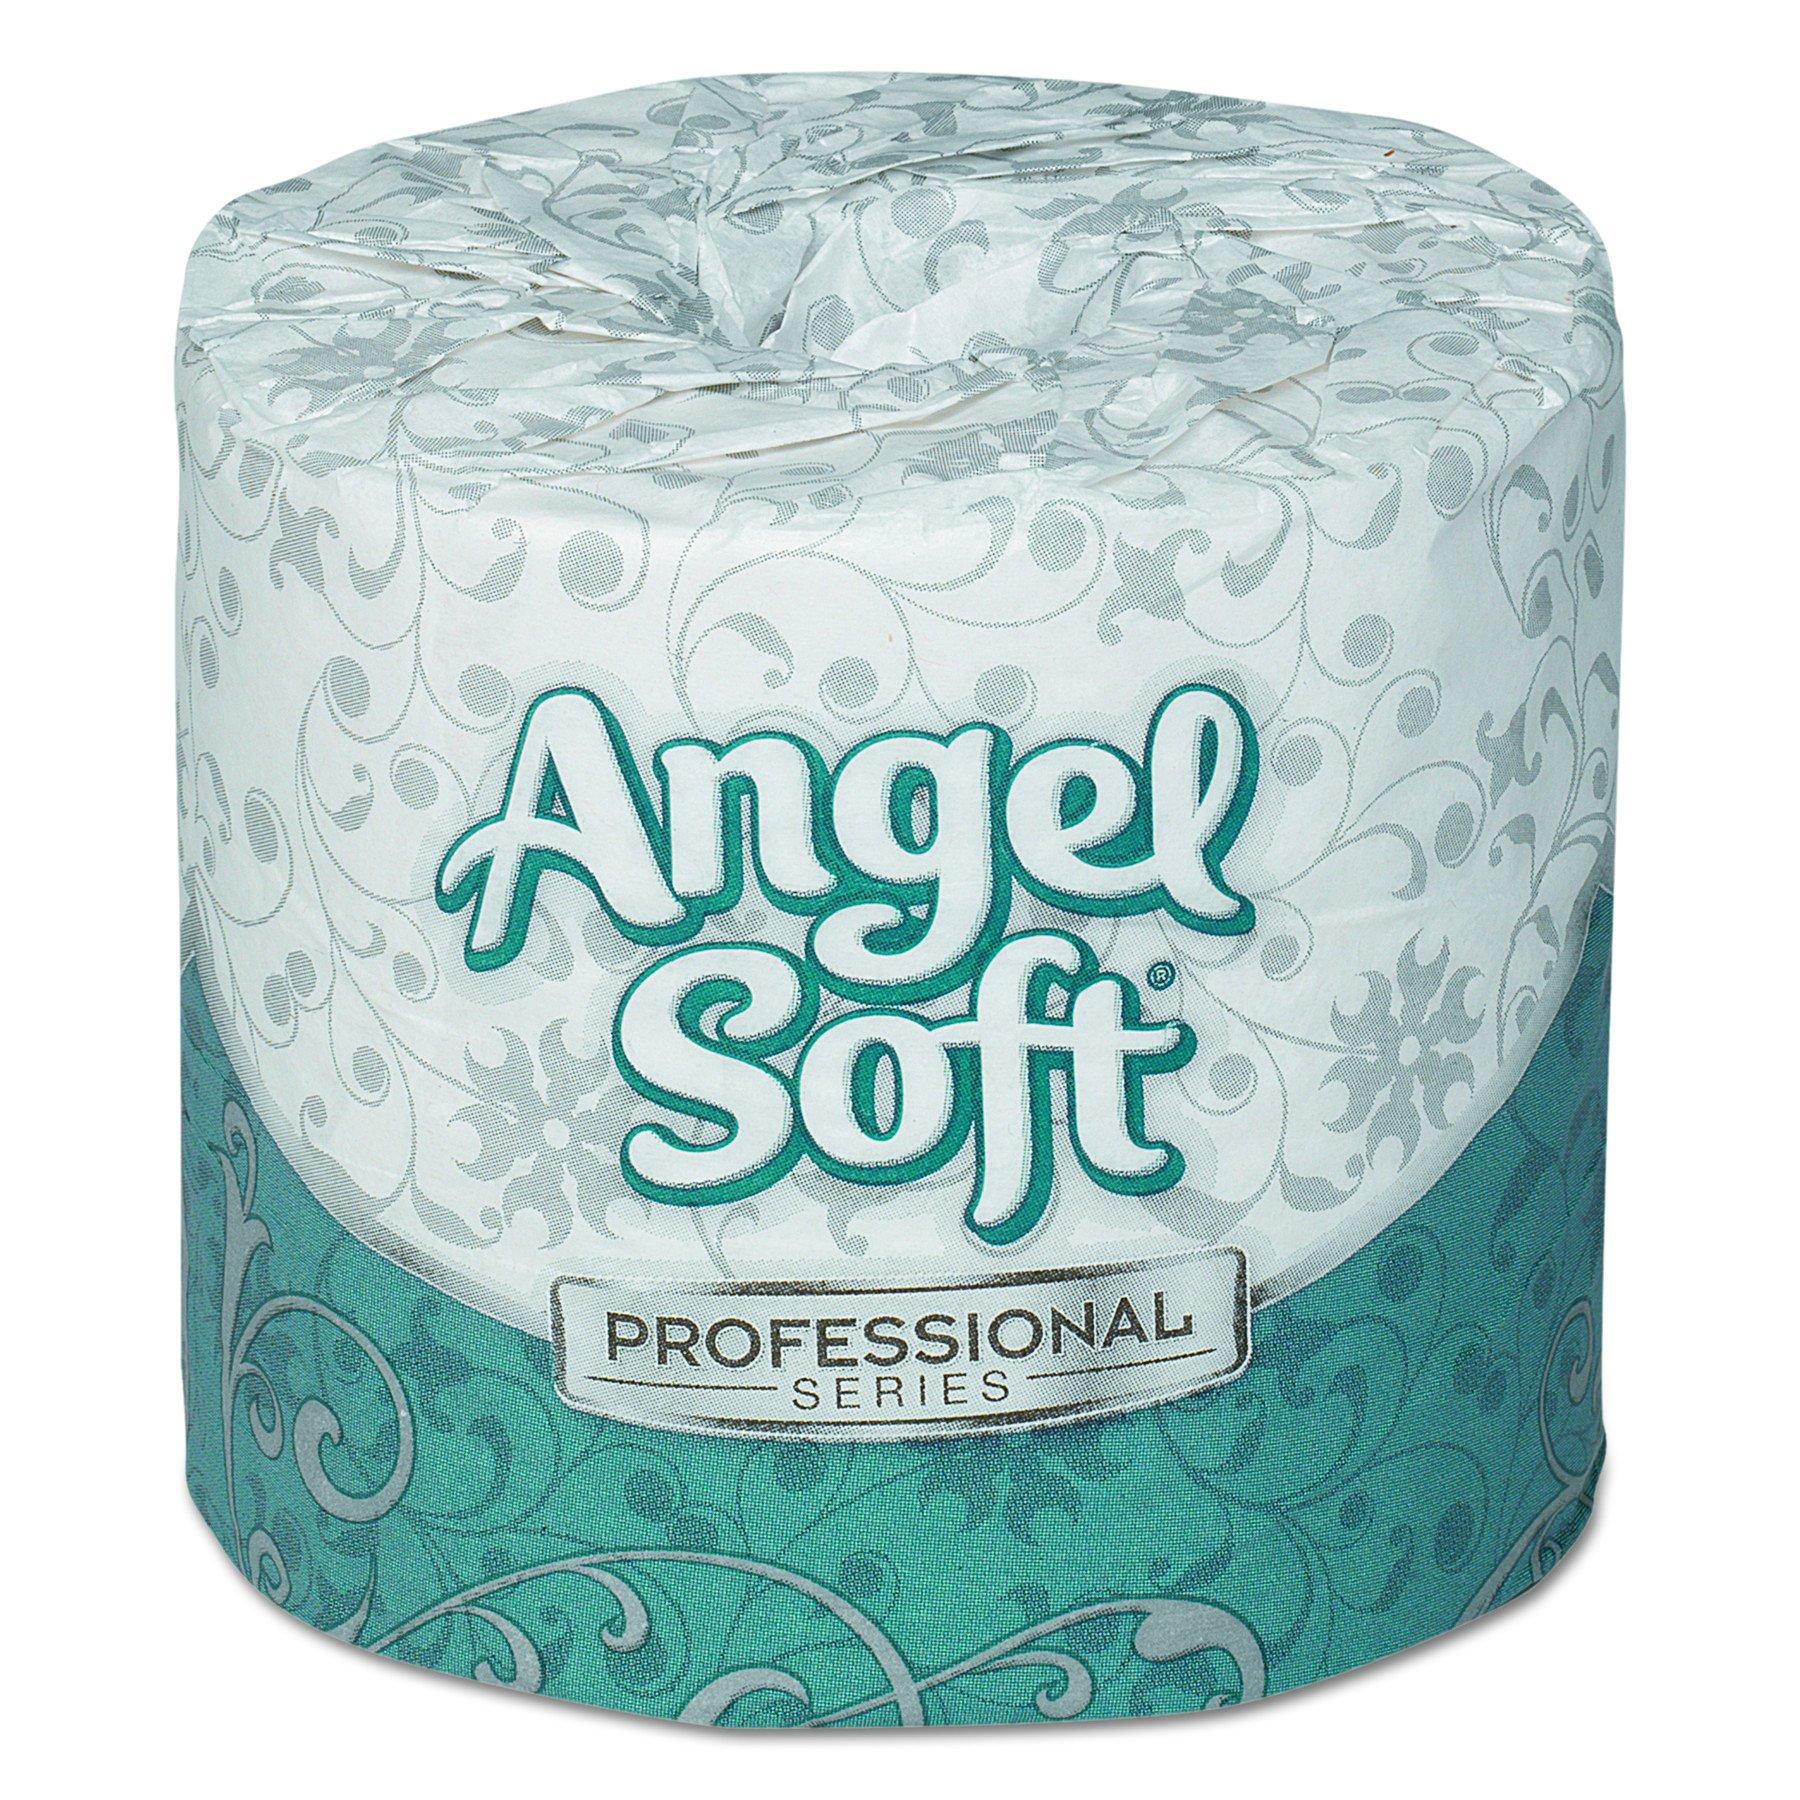 Georgia Pacific Professional 16880 Angel Soft ps Premium Bathroom Tissue, 450 Sheets per Roll (Case of 80 Rolls)